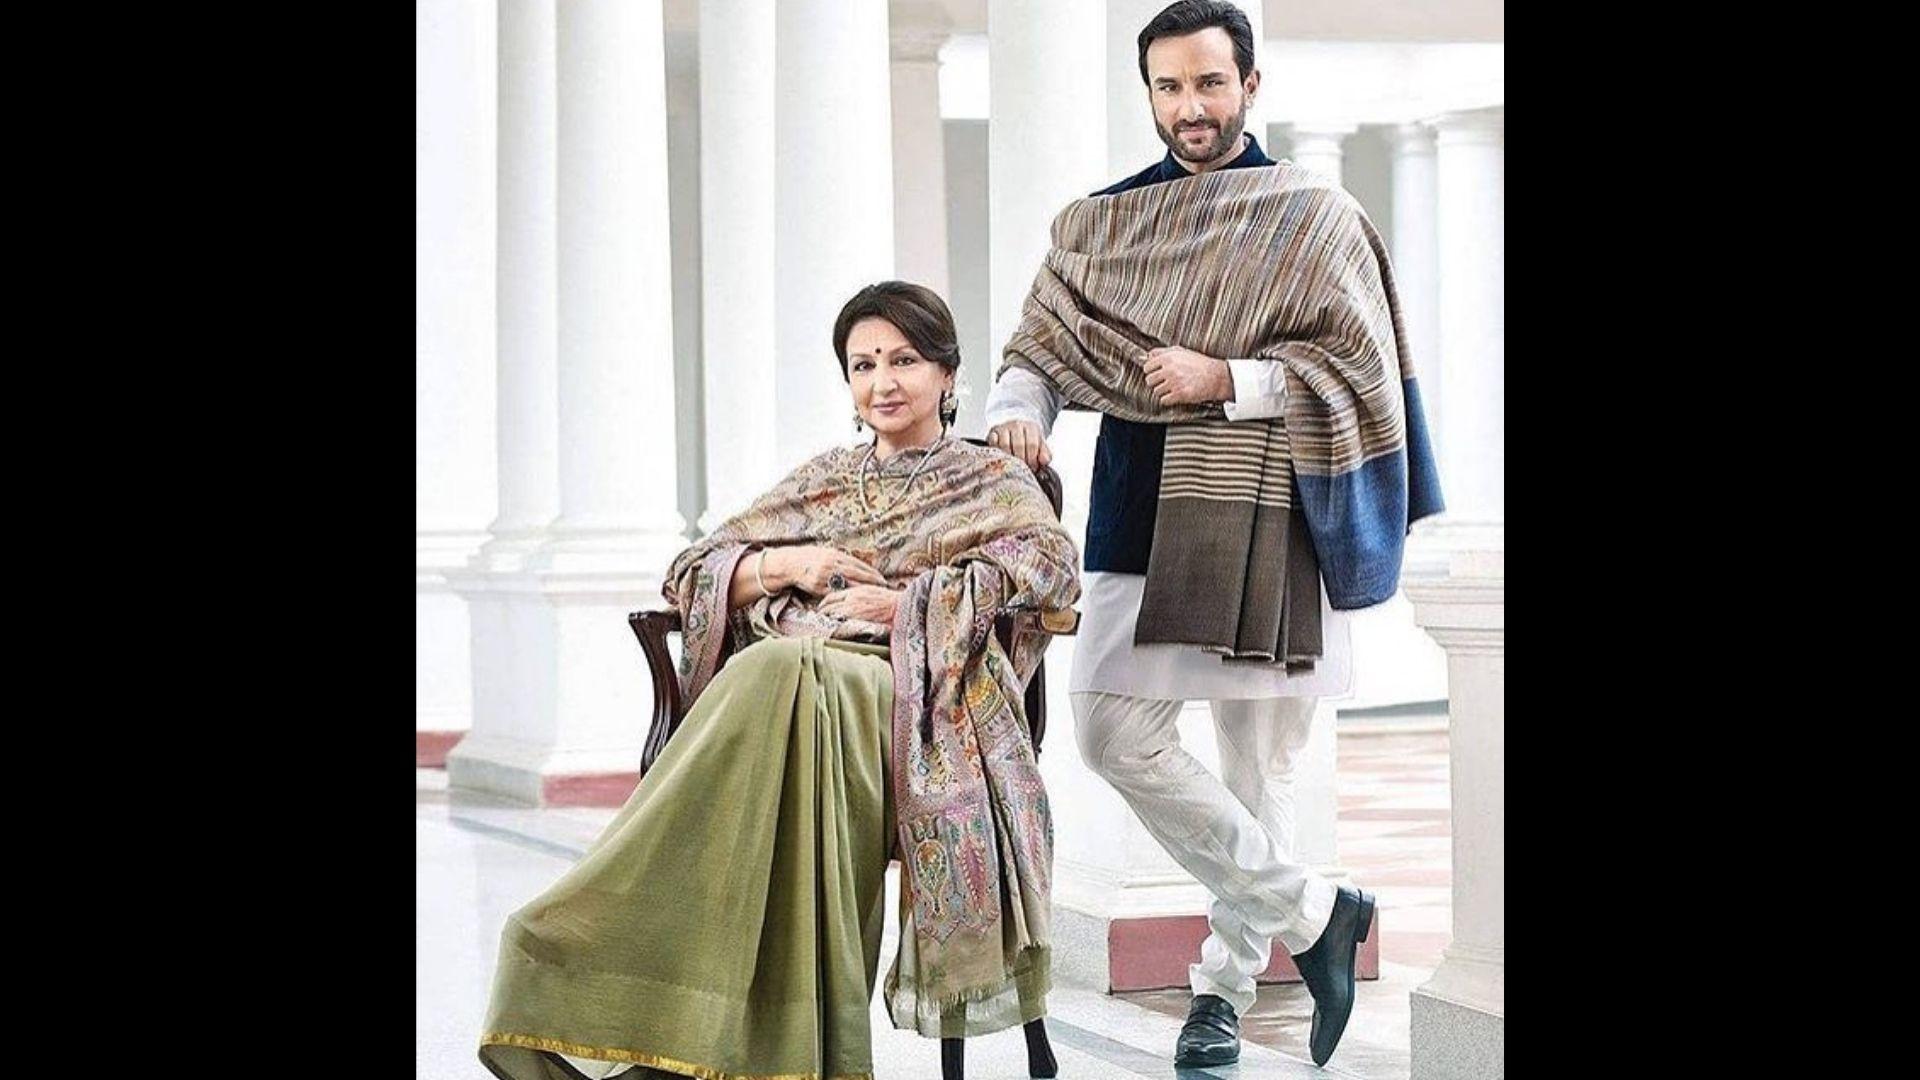 A Priceless Moment: Watch Sharmila Tagore Introduce Young Saif Ali Khan To Legendary Filmmaker Satyajit Ray